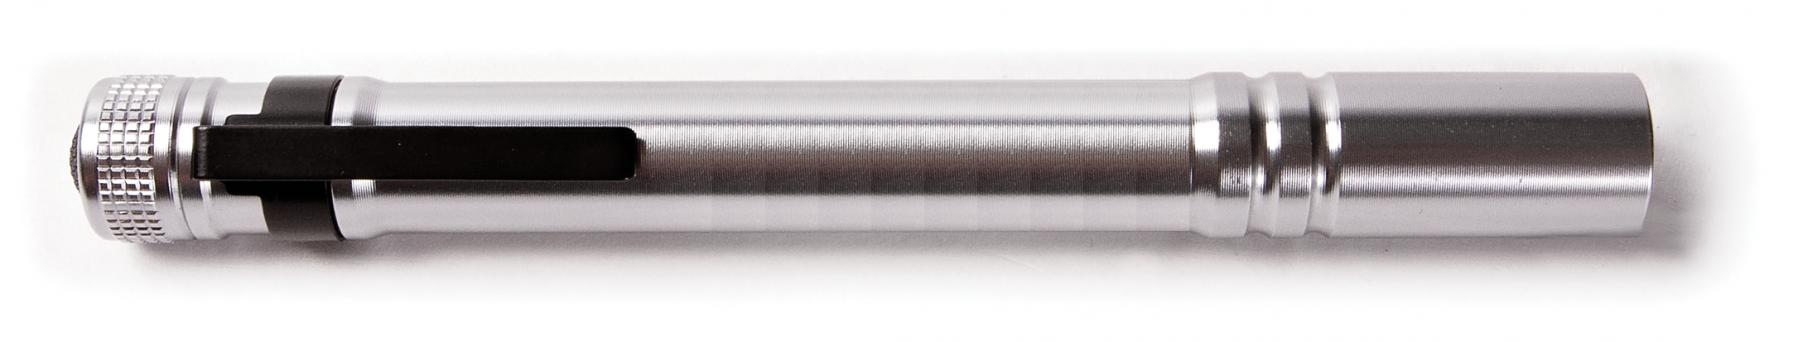 Earlite pen (non-branded)